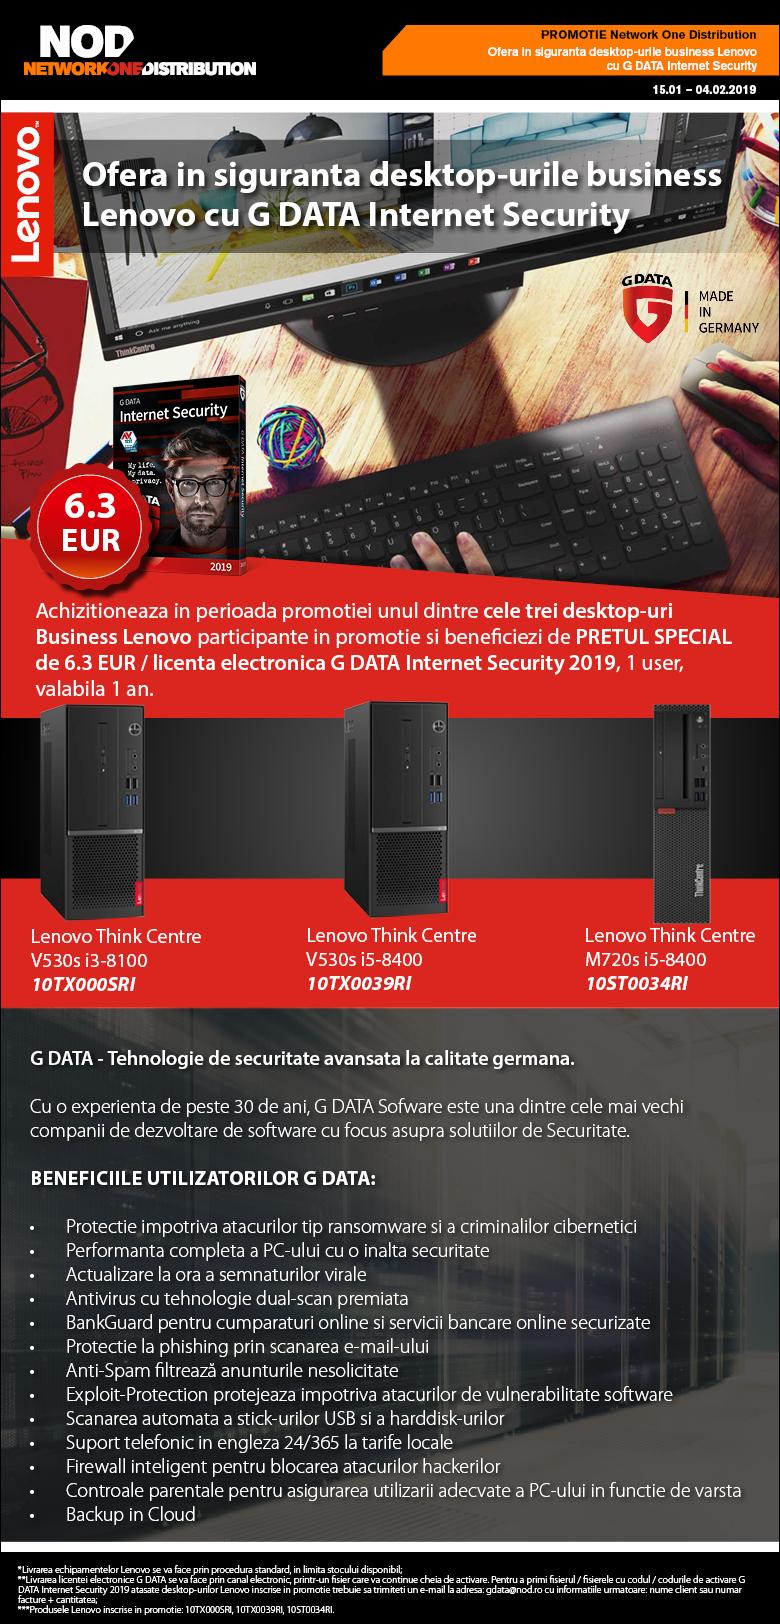 Ofera in siguranta desktop-urile business Lenovo cu G DATA Internet